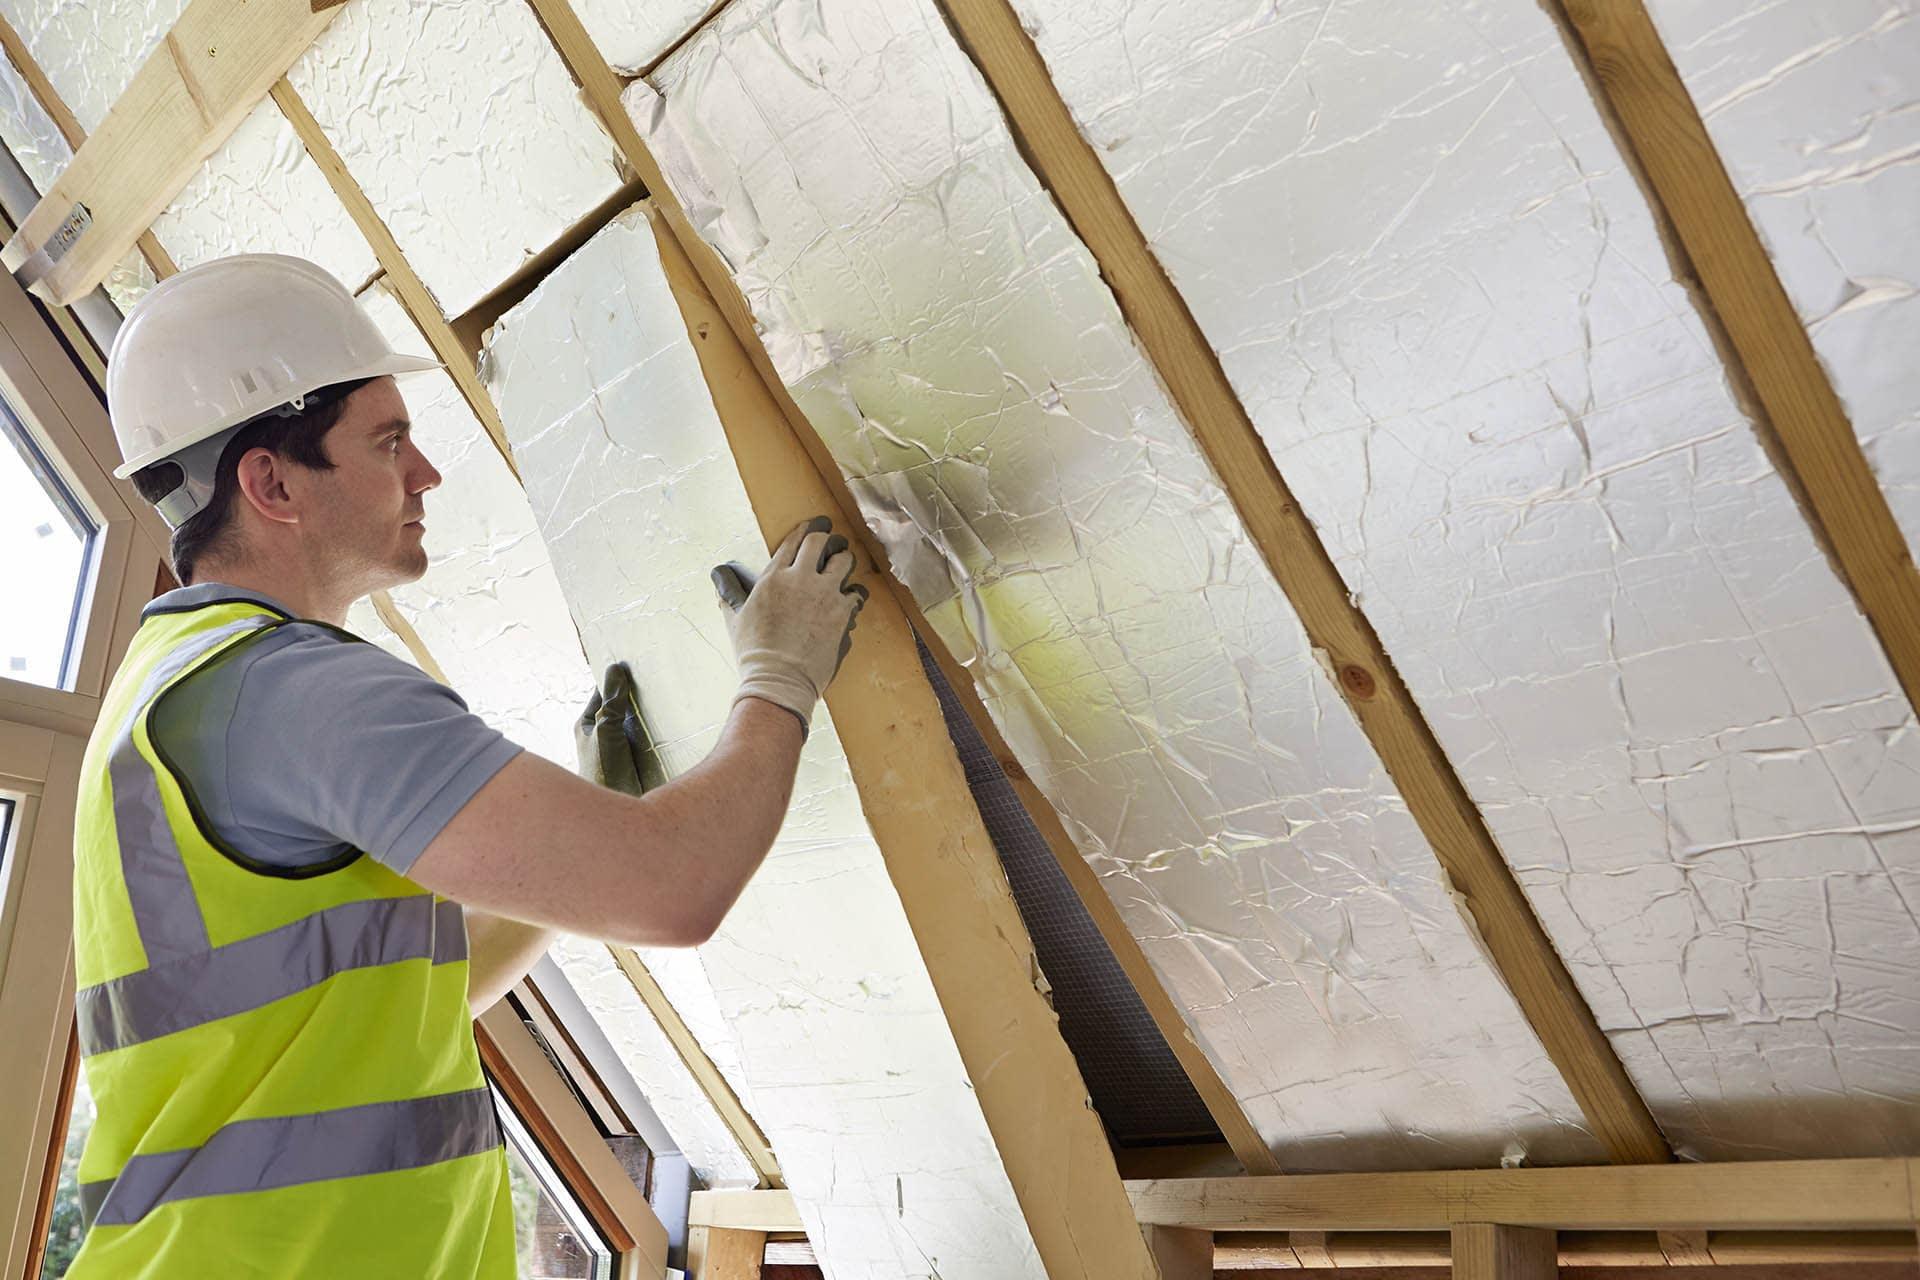 Builder installing block insulating board sheets - building materials